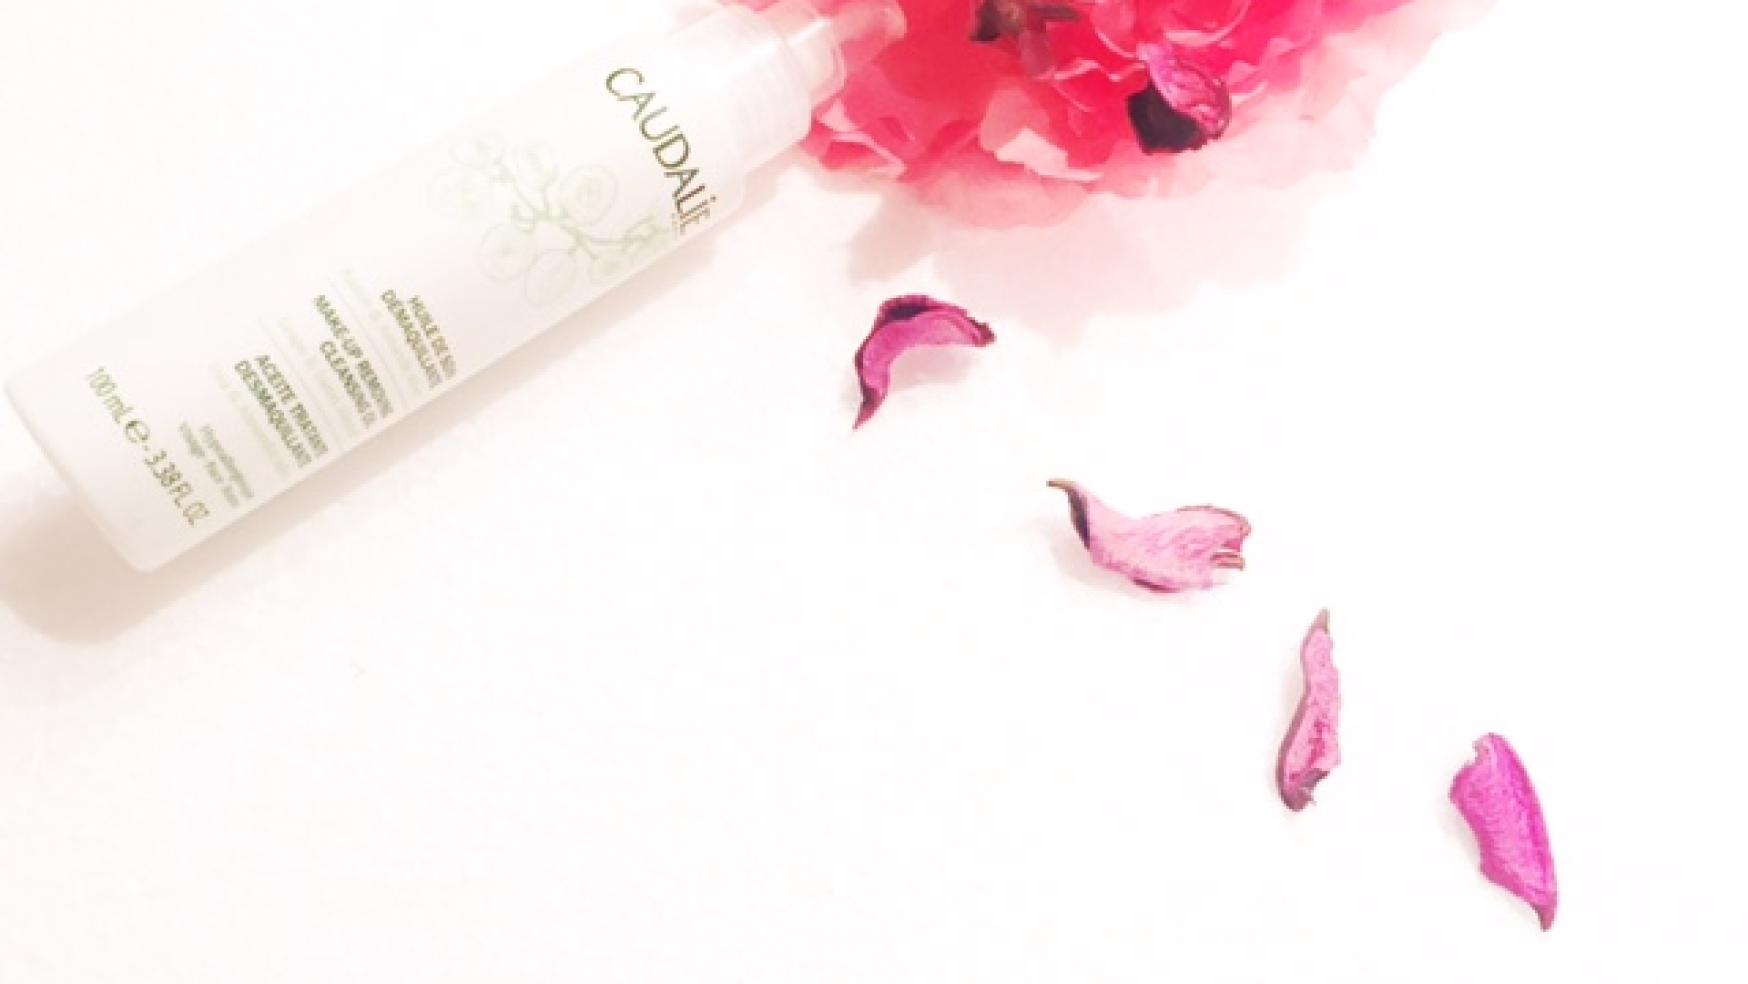 Caudalie – Make-up removing